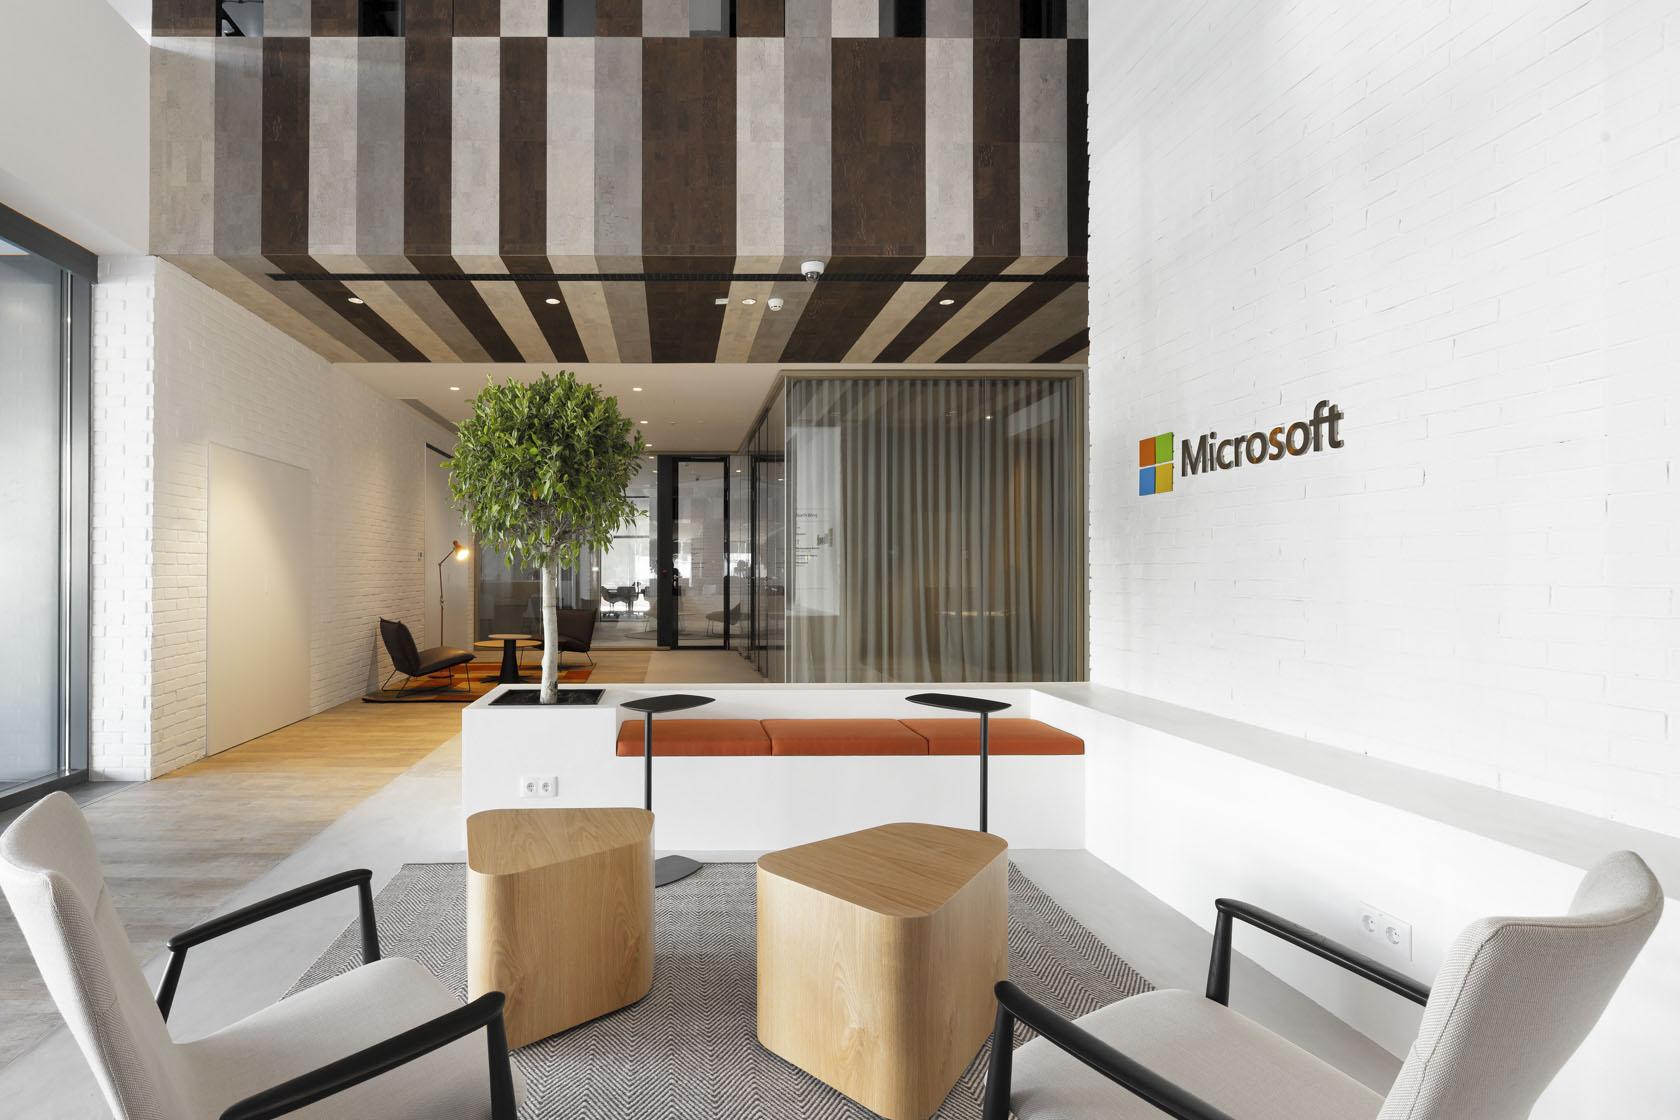 Microsoft_20190526_0180-4_copy_LR.jpg